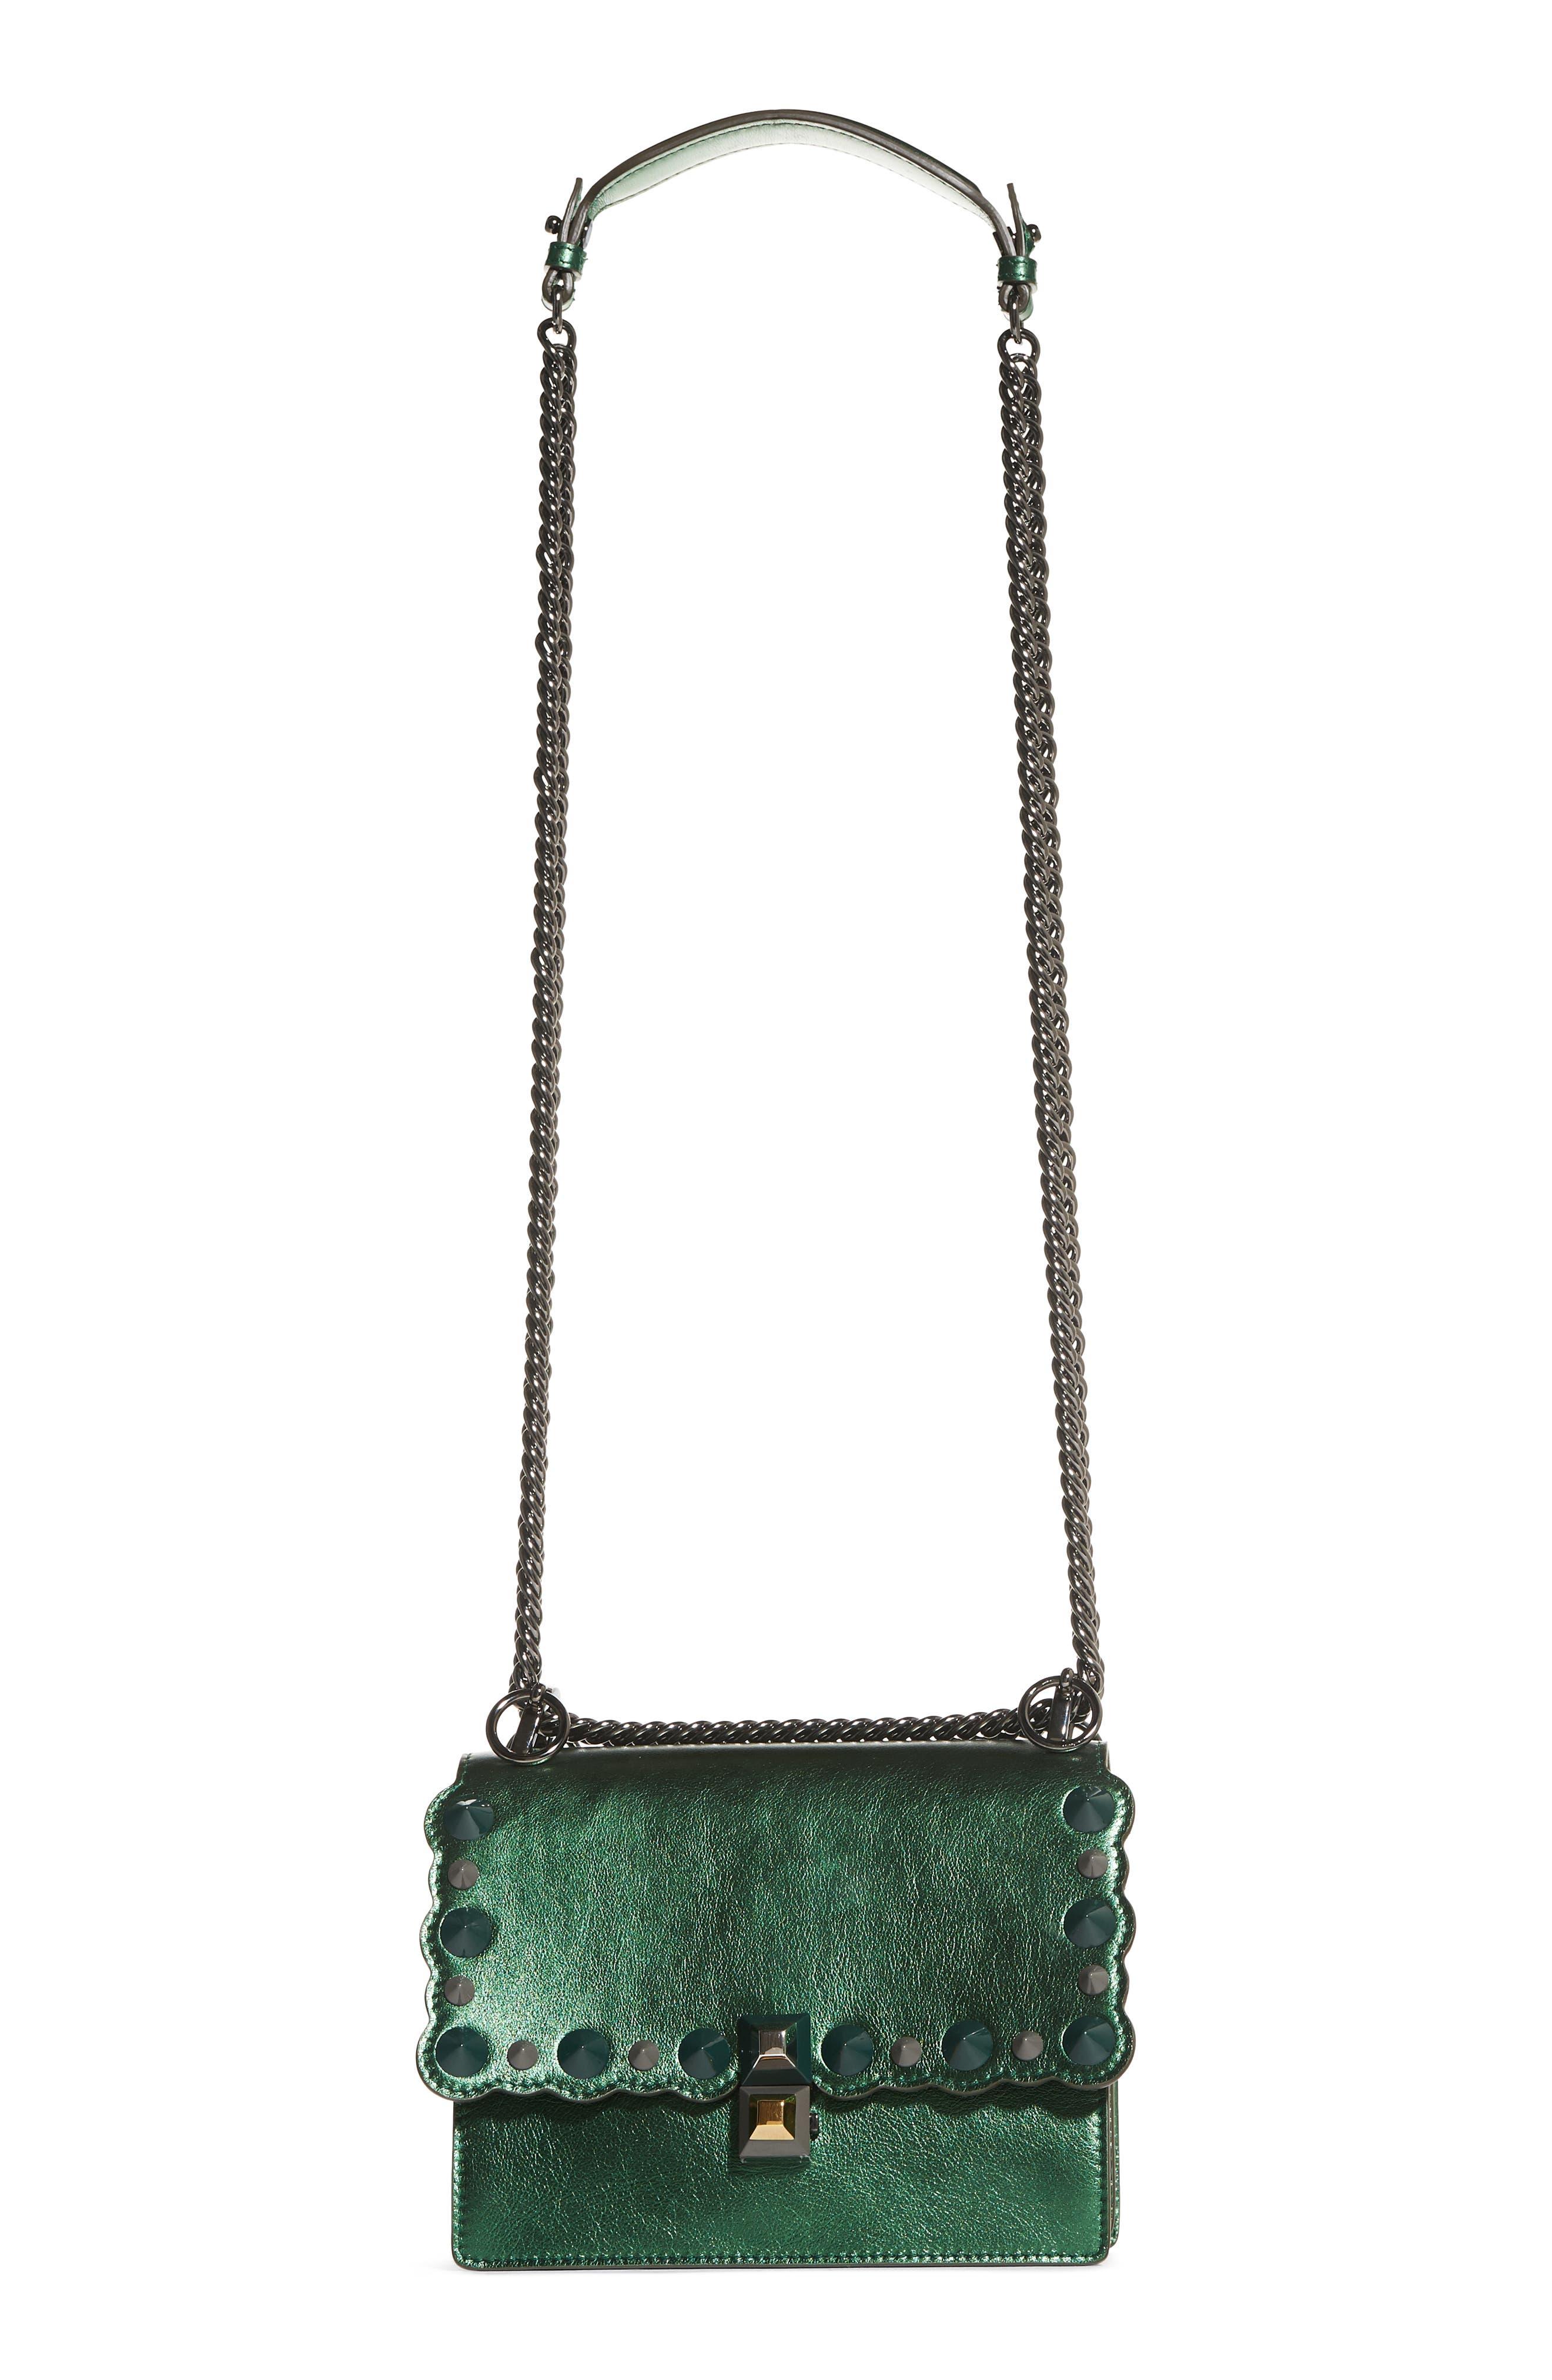 Alternate Image 1 Selected - Fendi Small Kan I Metallic Leather Shoulder Bag